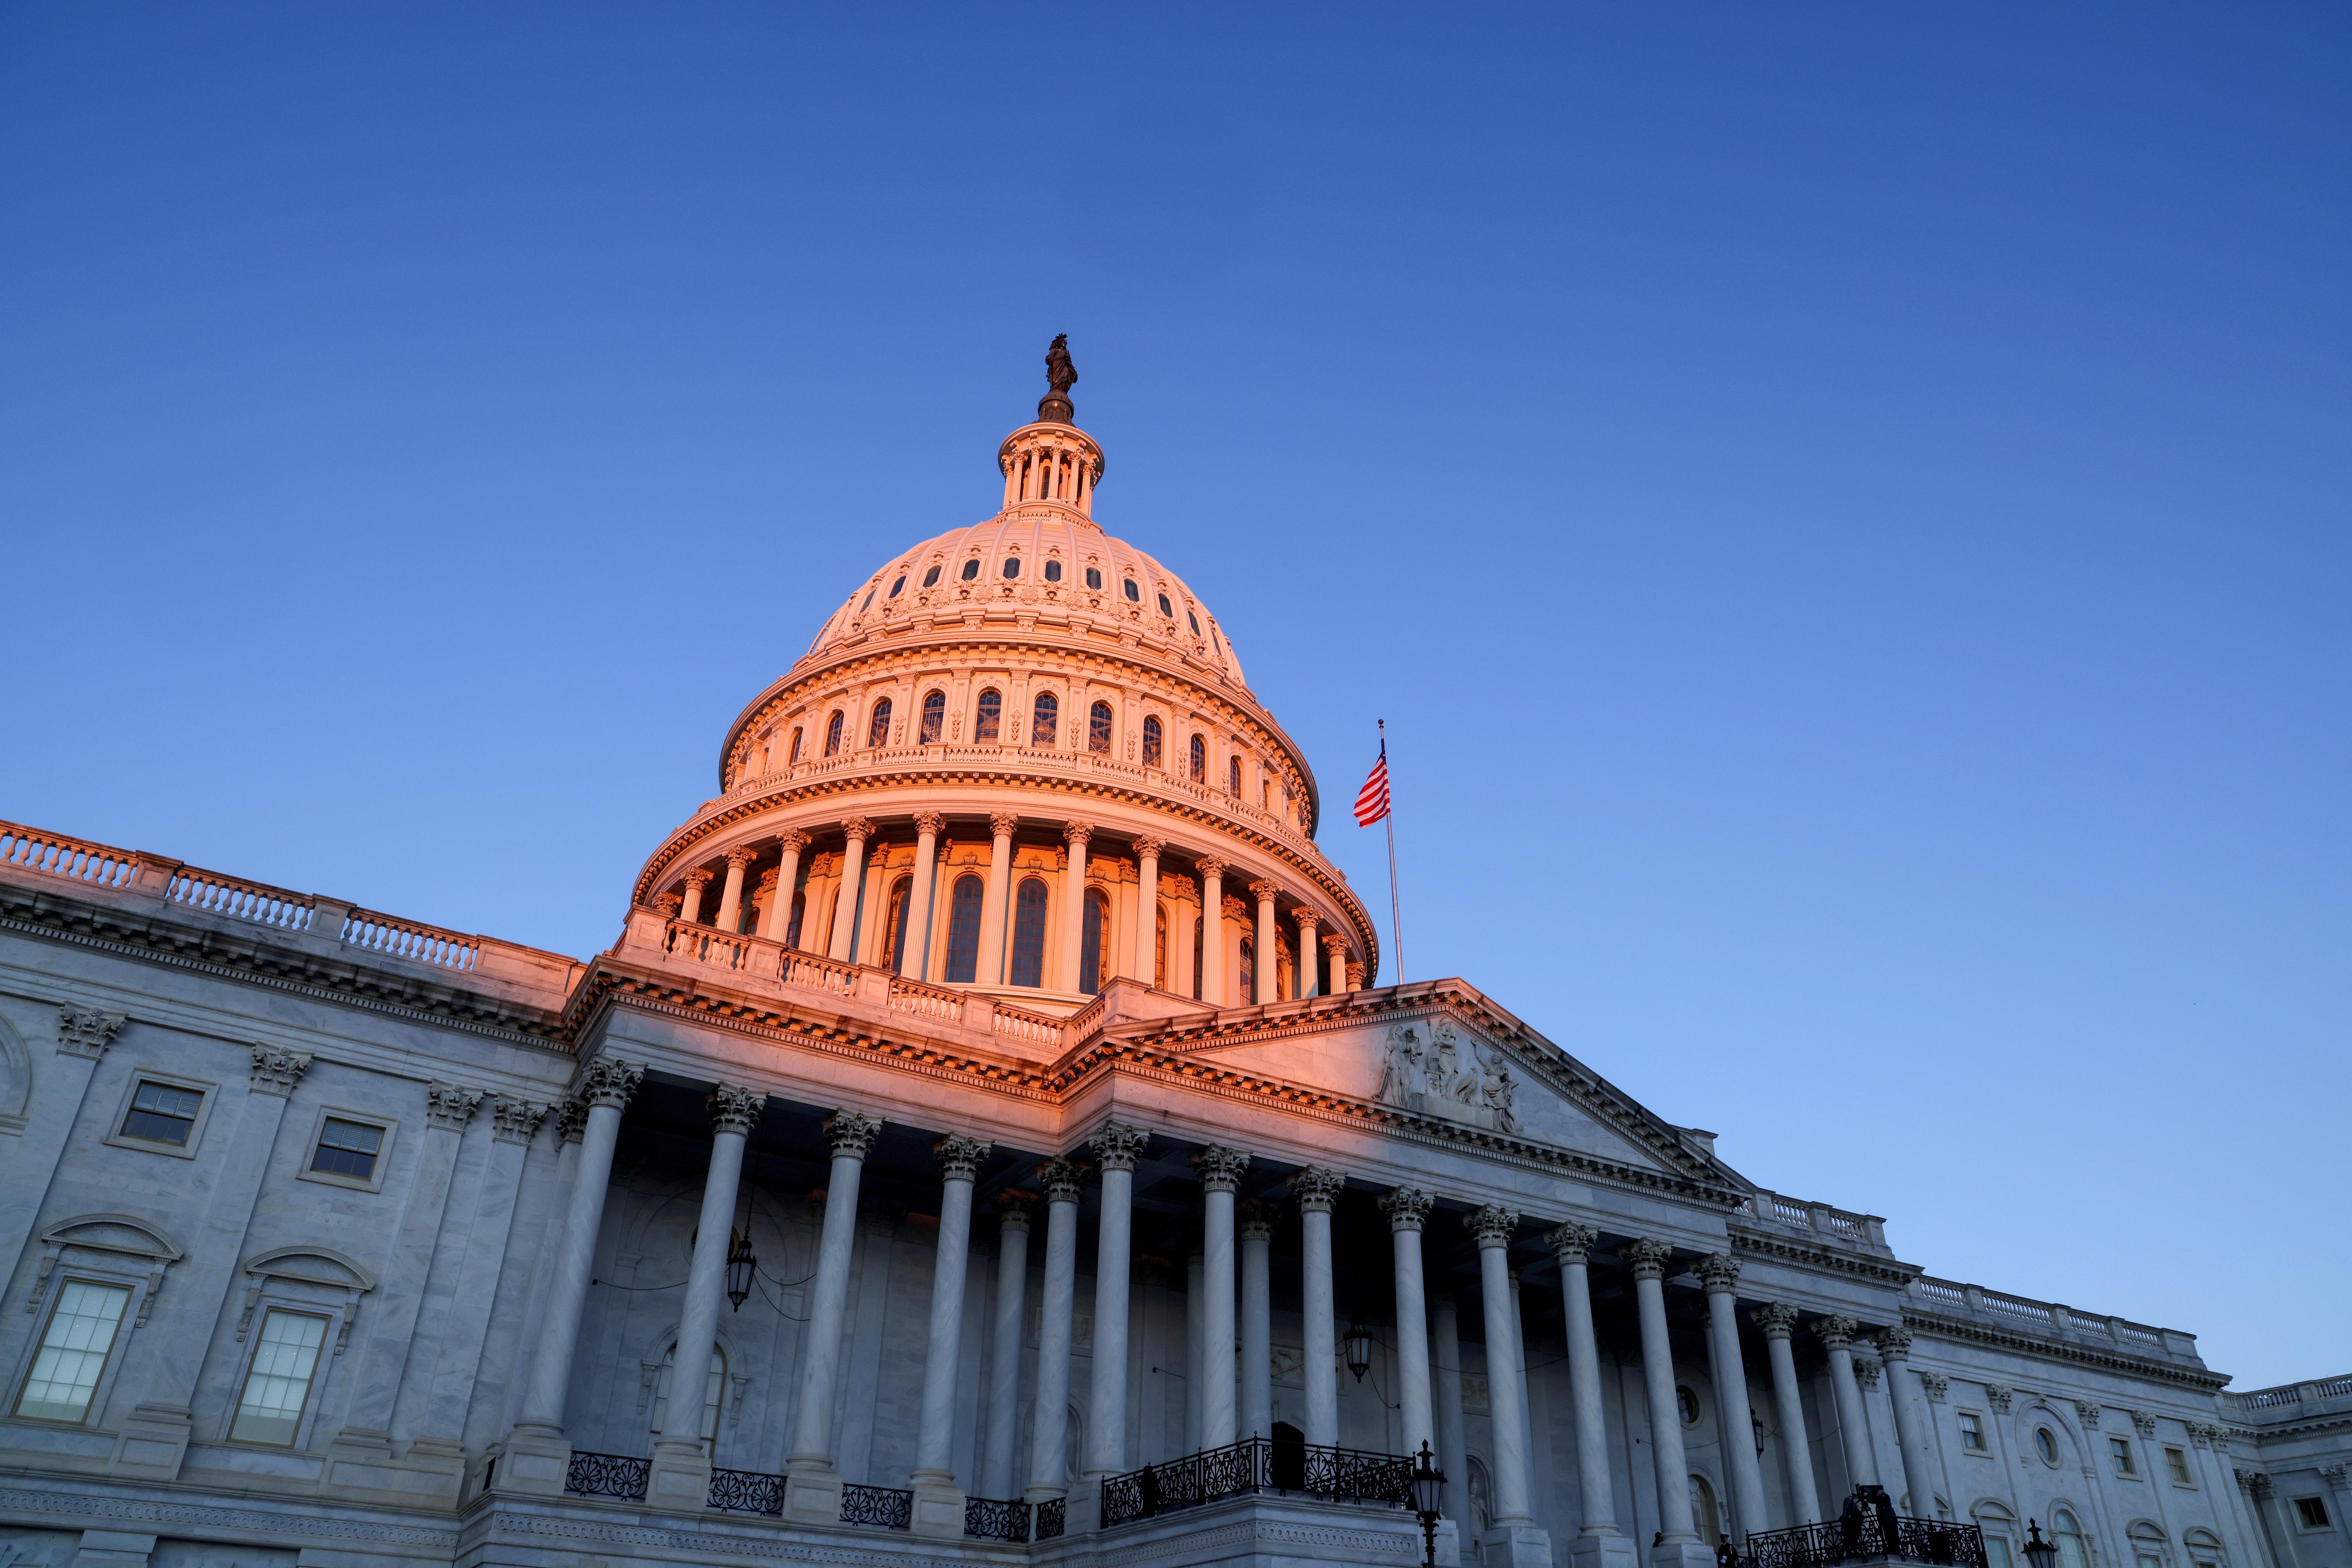 The sun rises on the U.S. Capitol dome before Joe Biden's presidential inauguration in Washington, U.S., January 20, 2021. REUTERS/Jonathan Ernst/File Photo